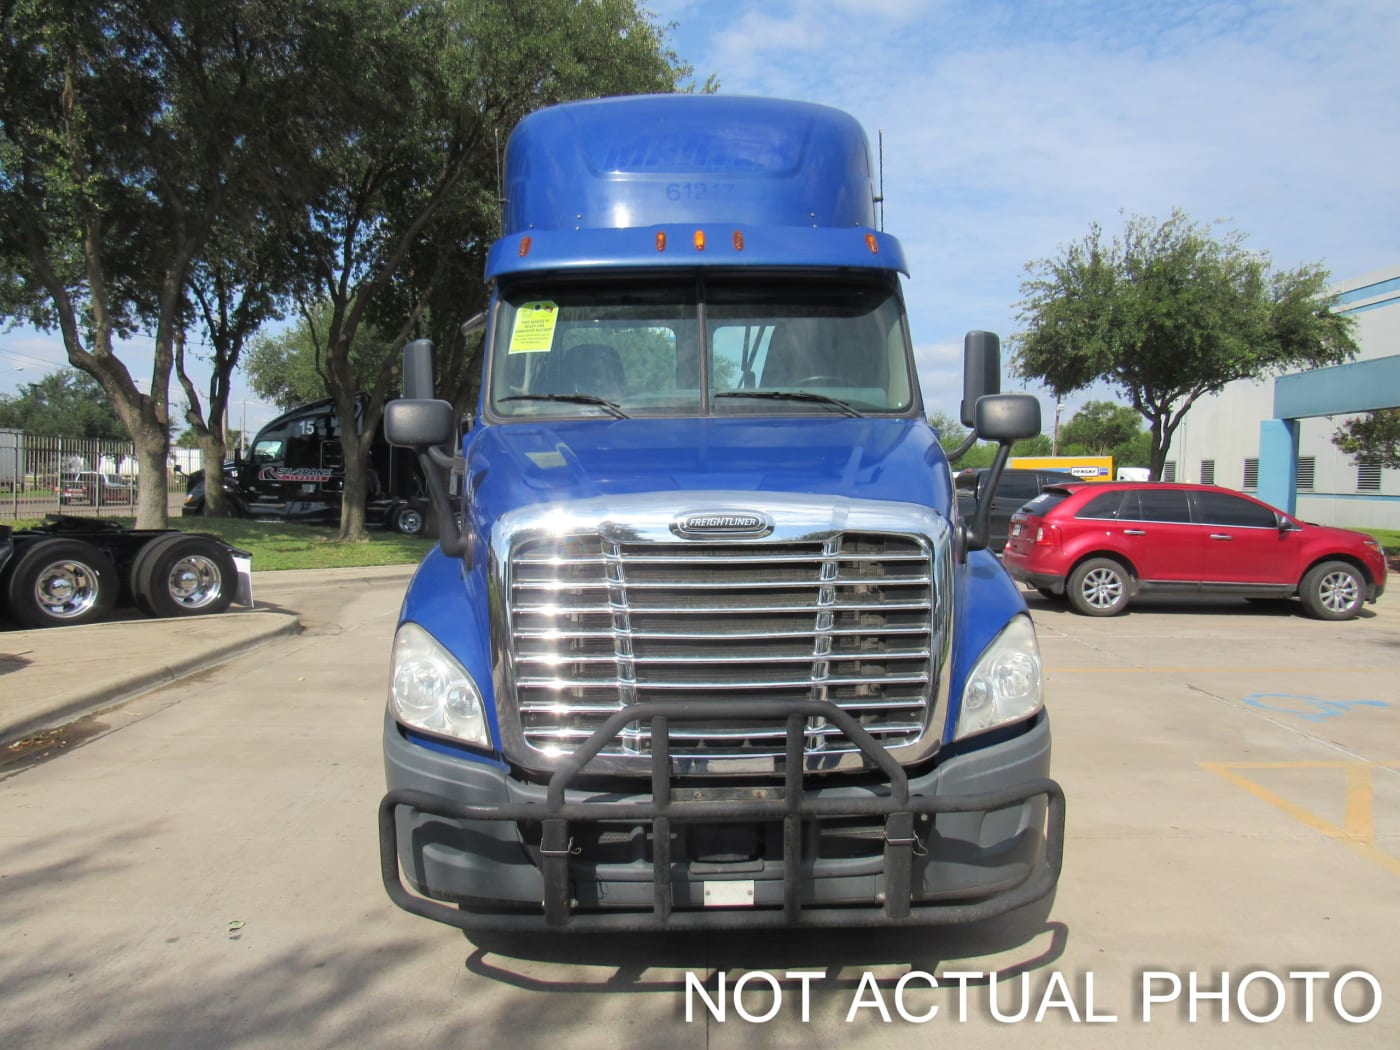 2015 Freightliner Cascadia 125 UFSGA3458 full